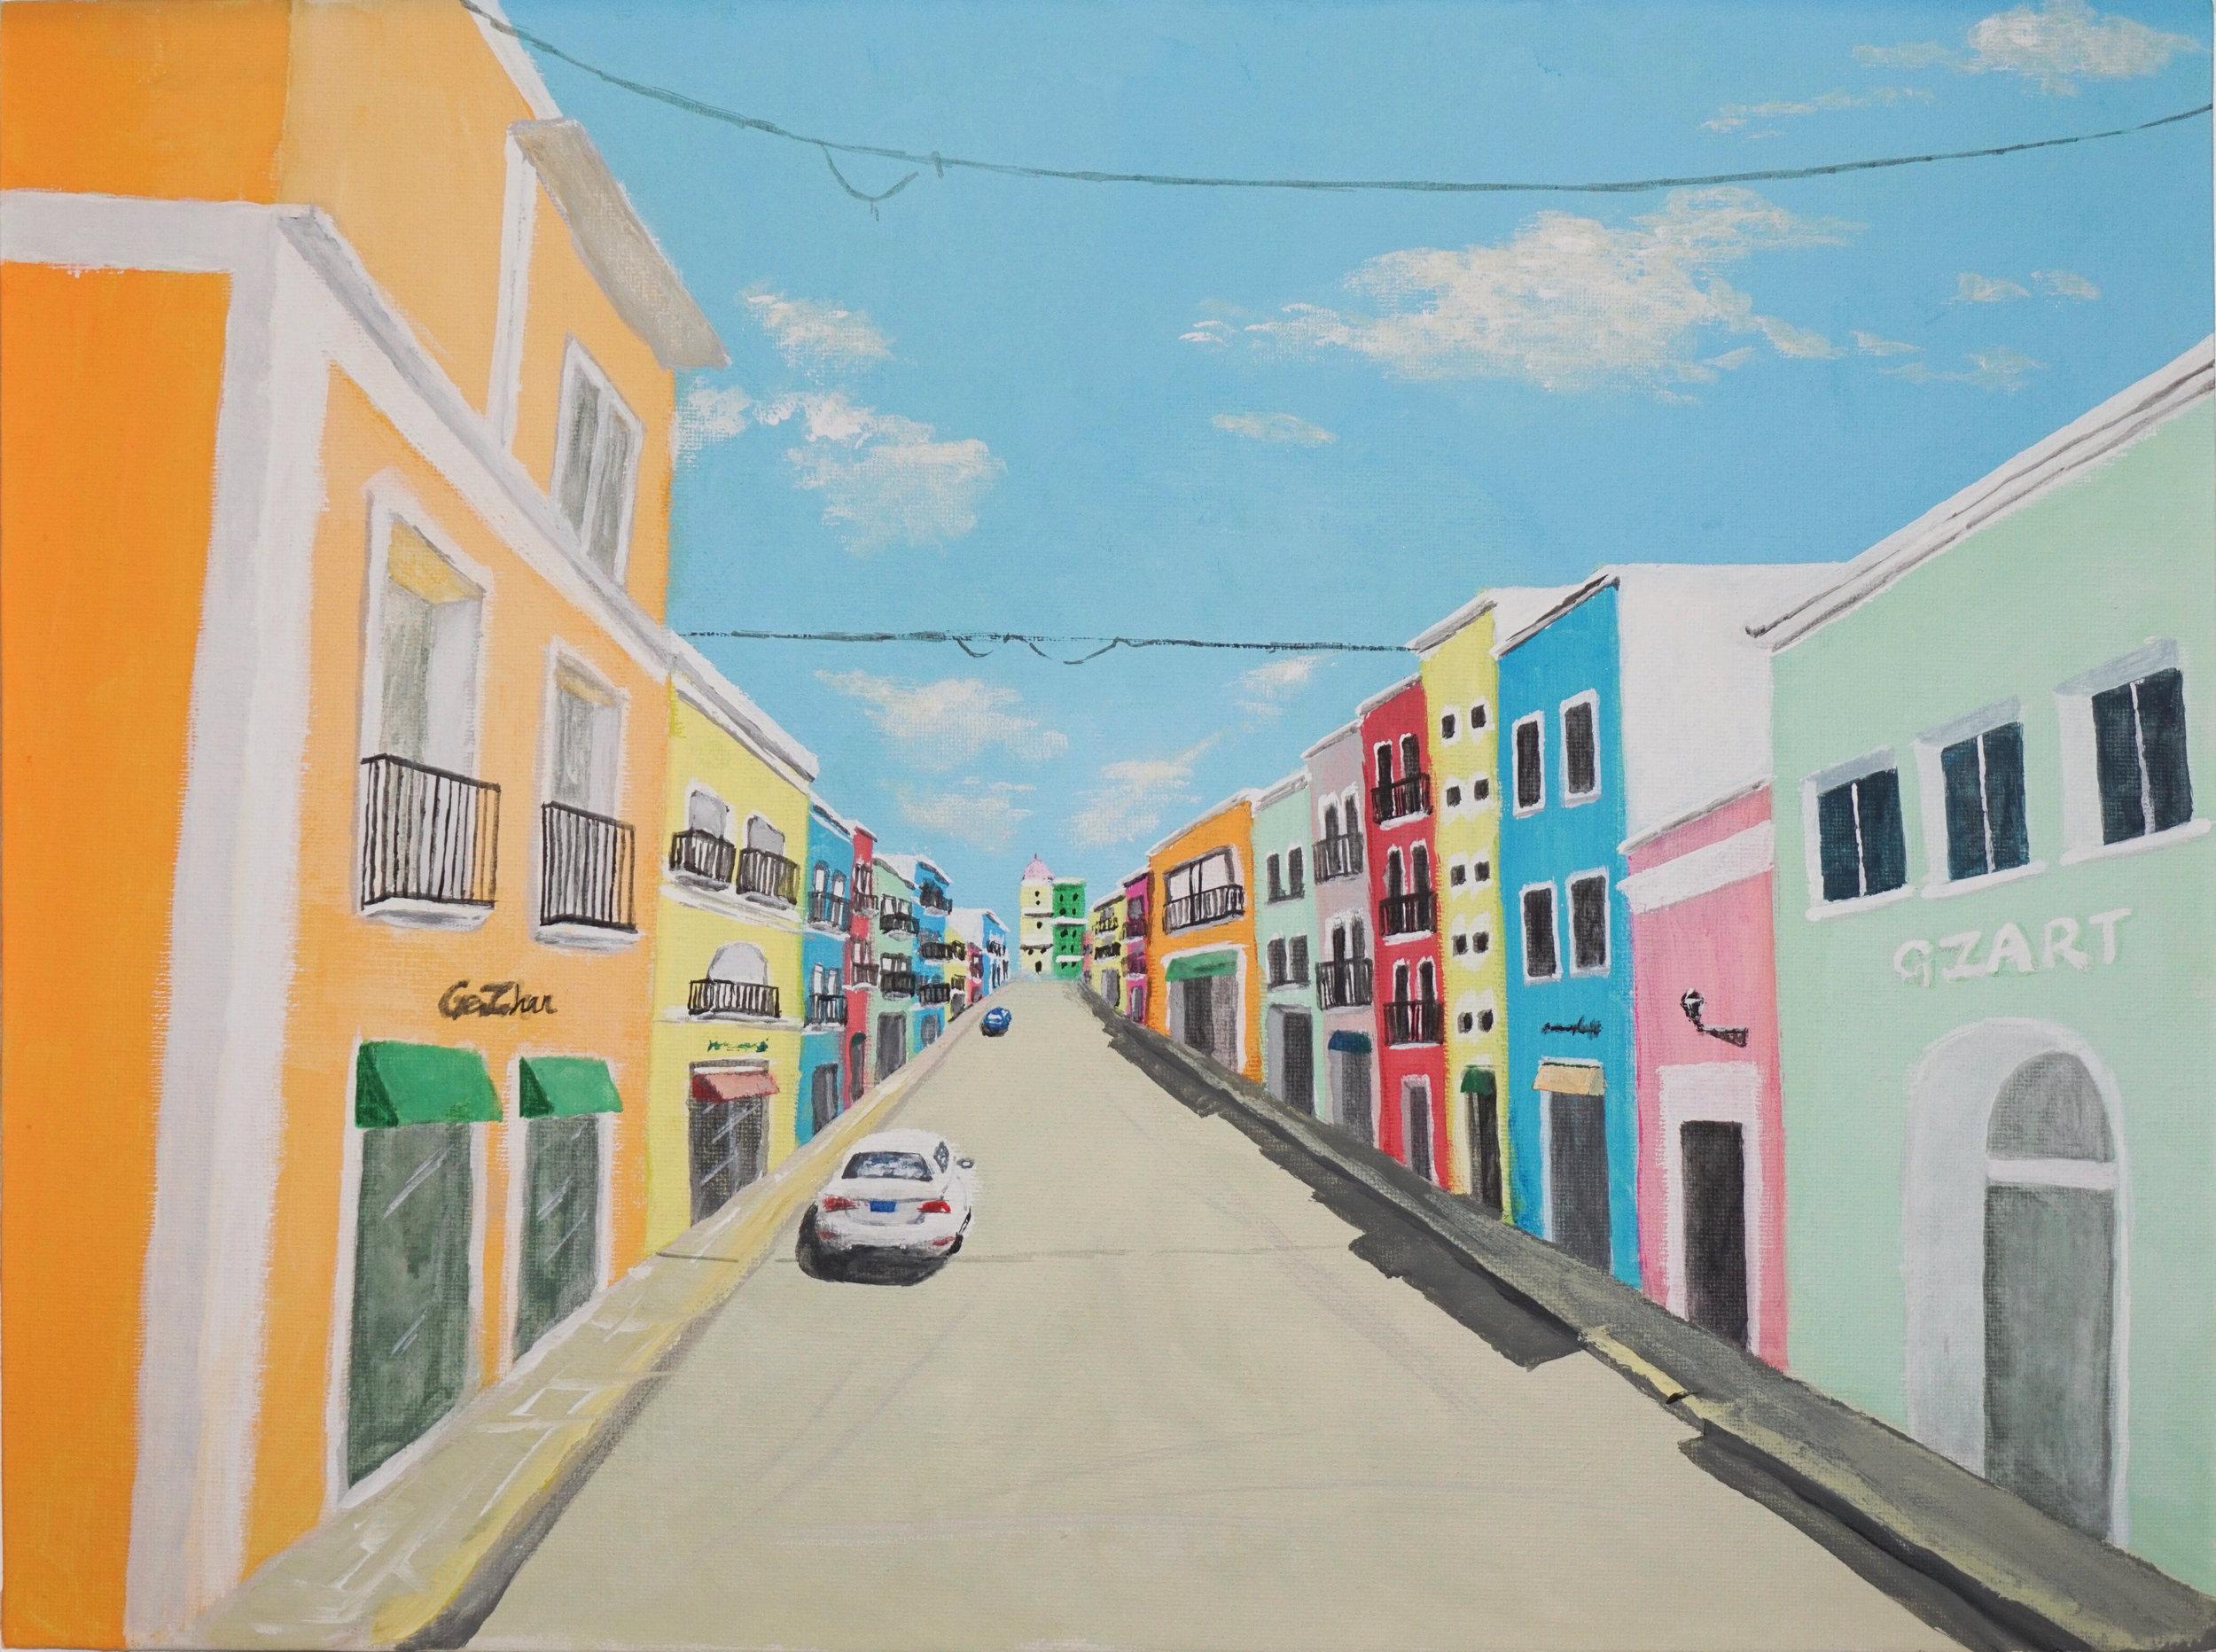 20496926-Ge Zhan_Sunny Day in San Juan_Acrylic on canvas_12x16_250.jpg